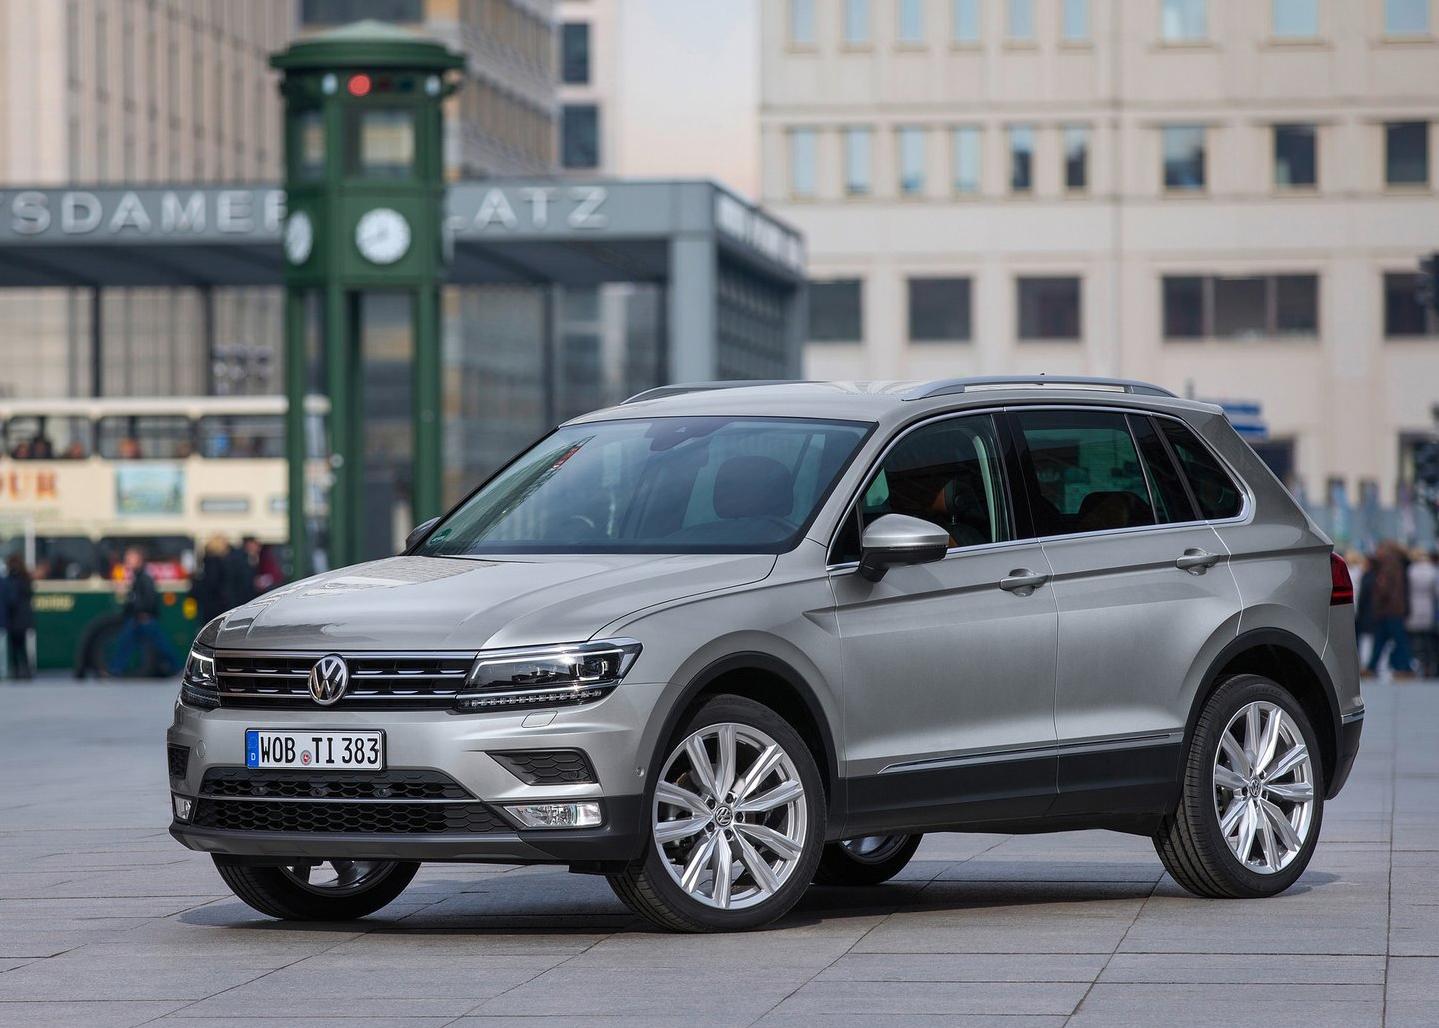 2016 Volkswagen Tiguan - Price and Features For Australia